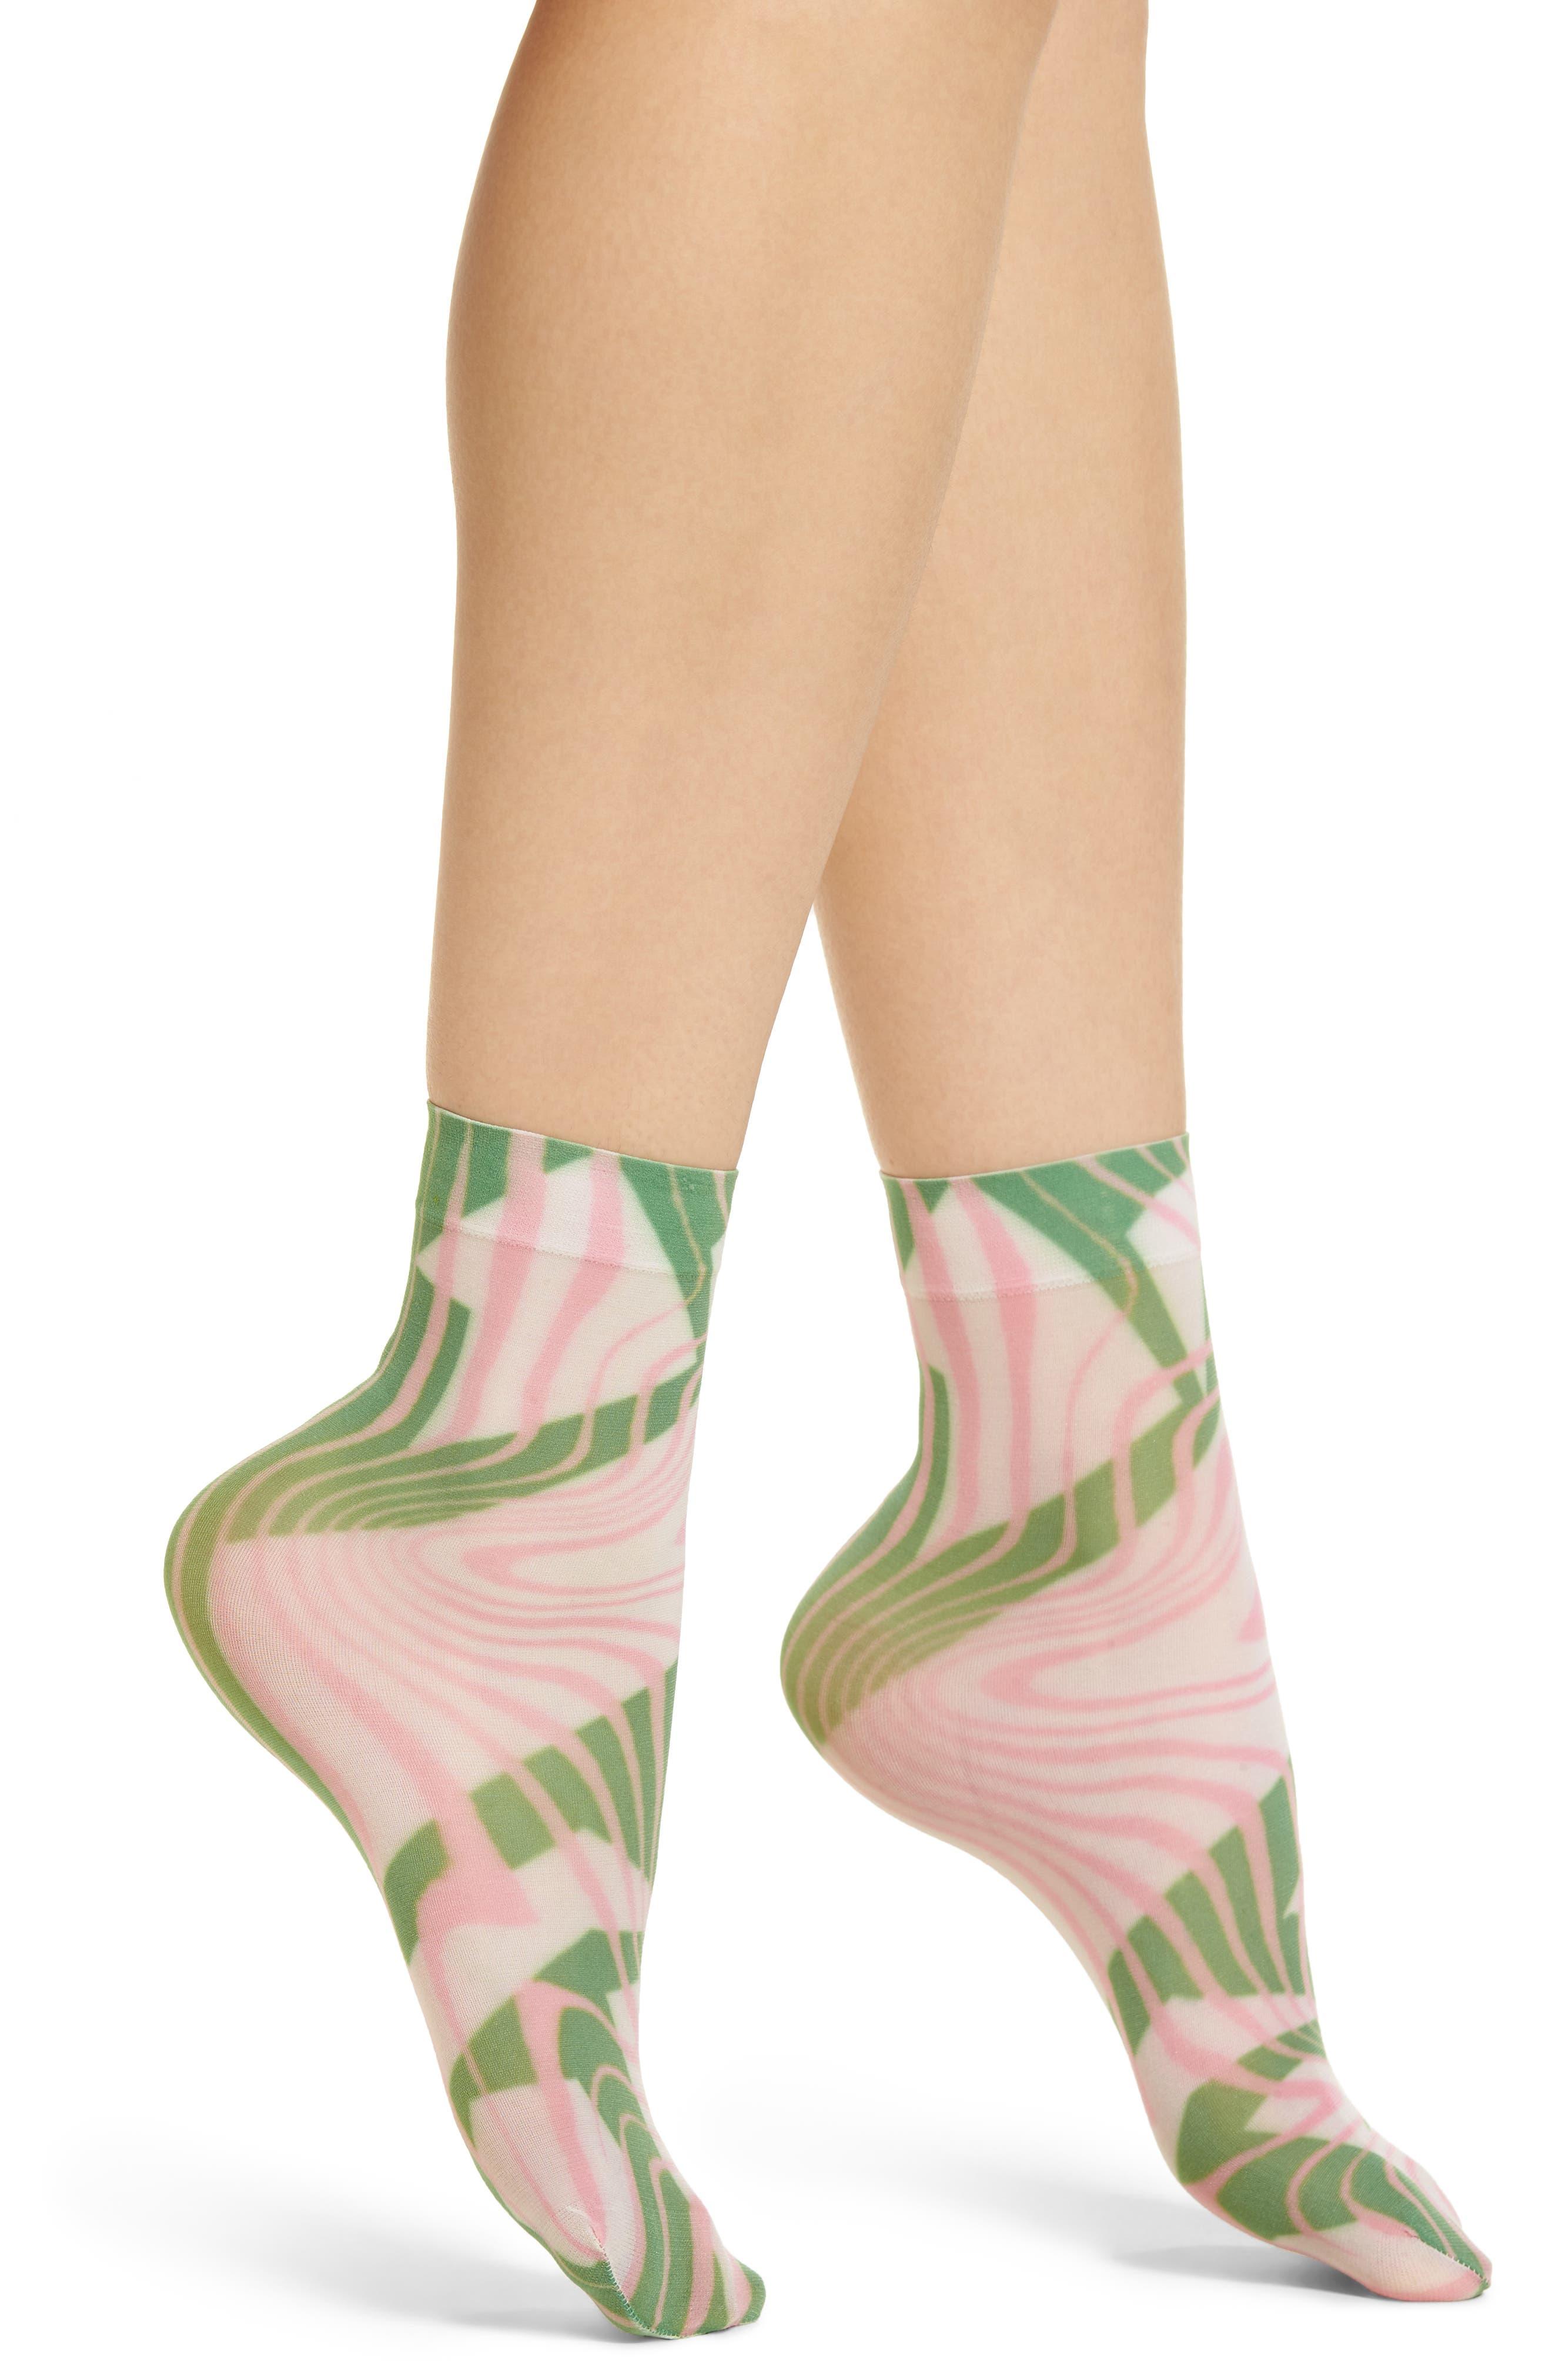 Mia Ankle Socks,                             Main thumbnail 1, color,                             685